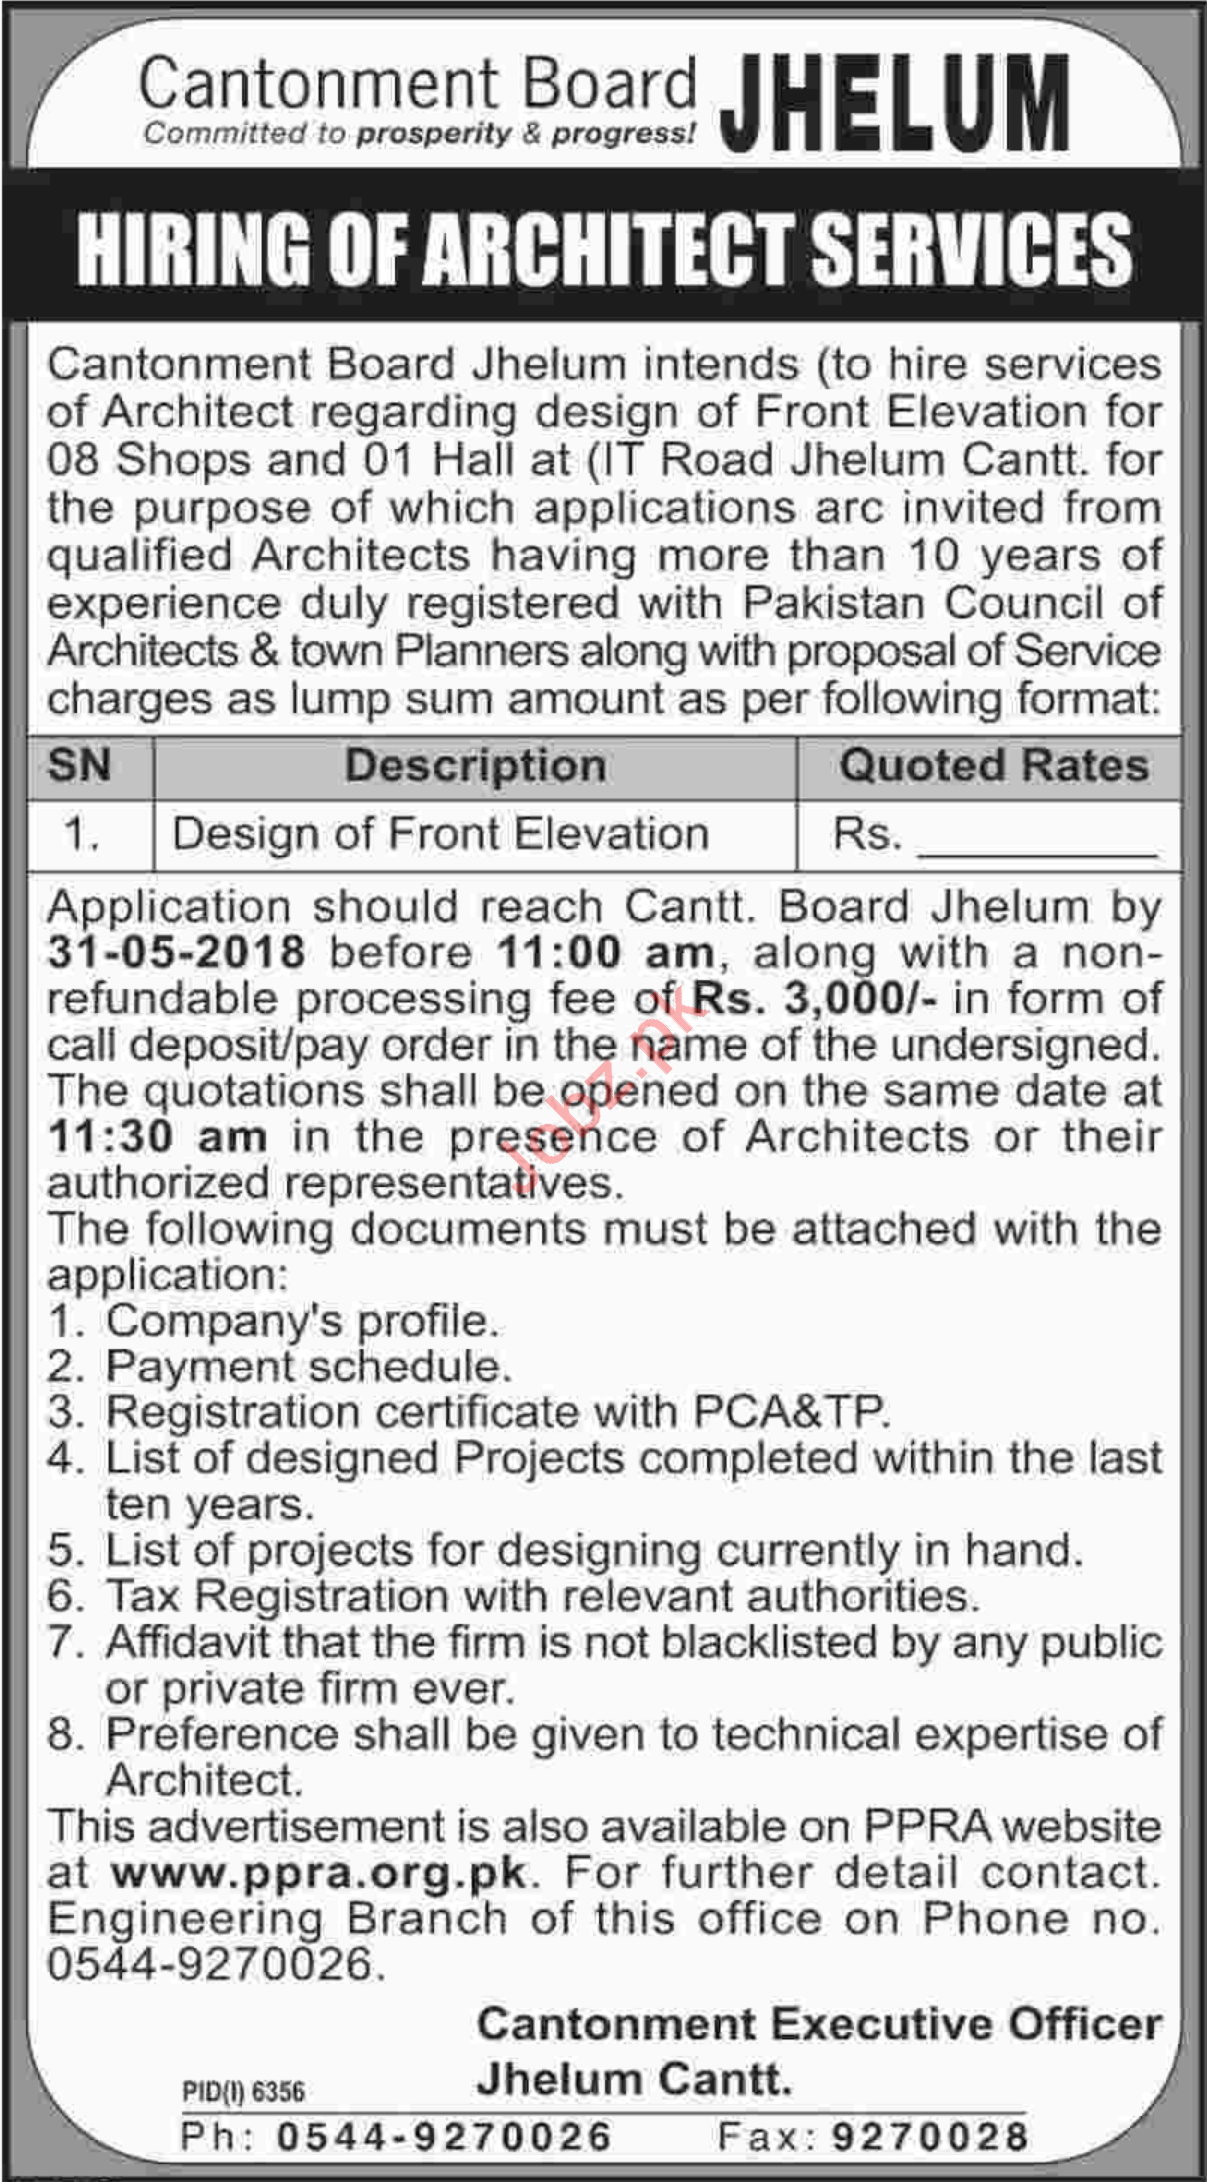 Cantonment Board CB Jhelum Hiring Architect Services